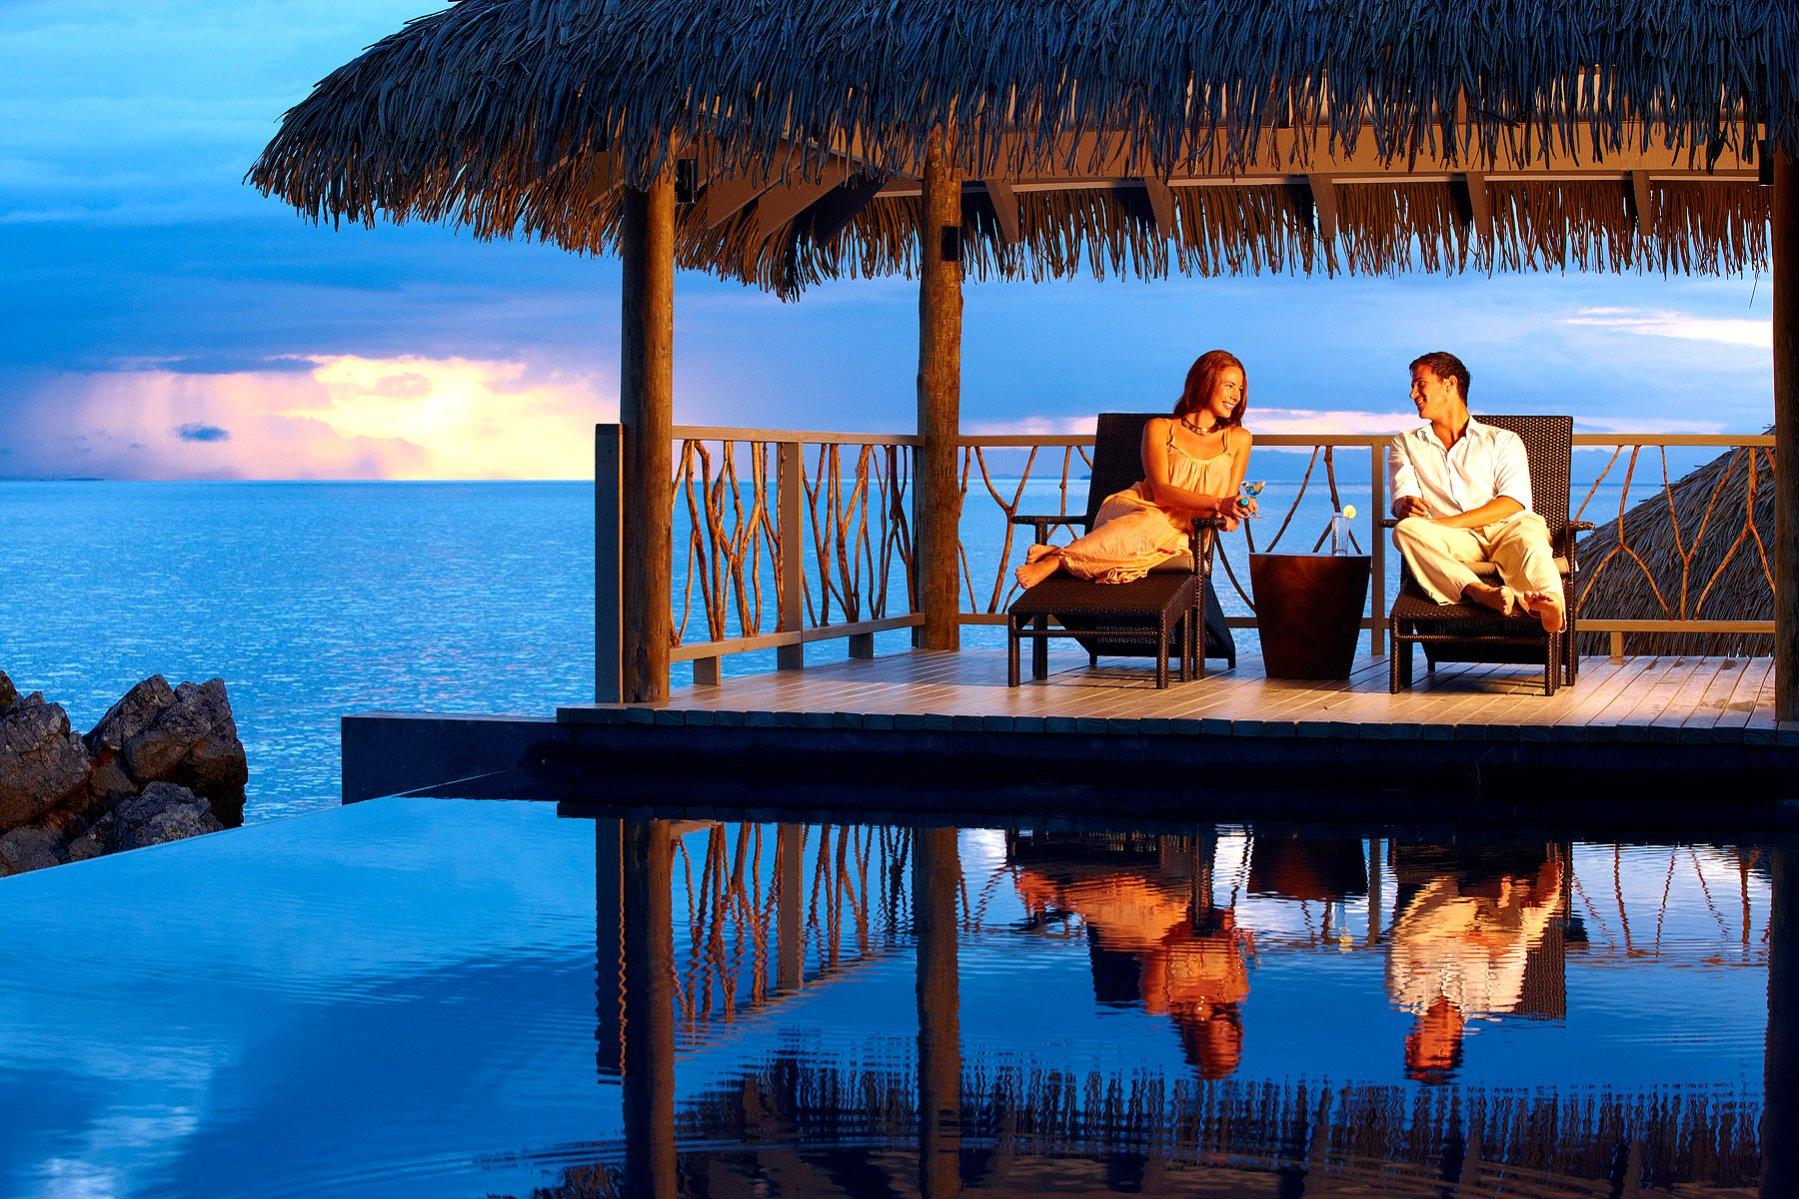 Best Romantic Vacation Or Honeymoon Destinations